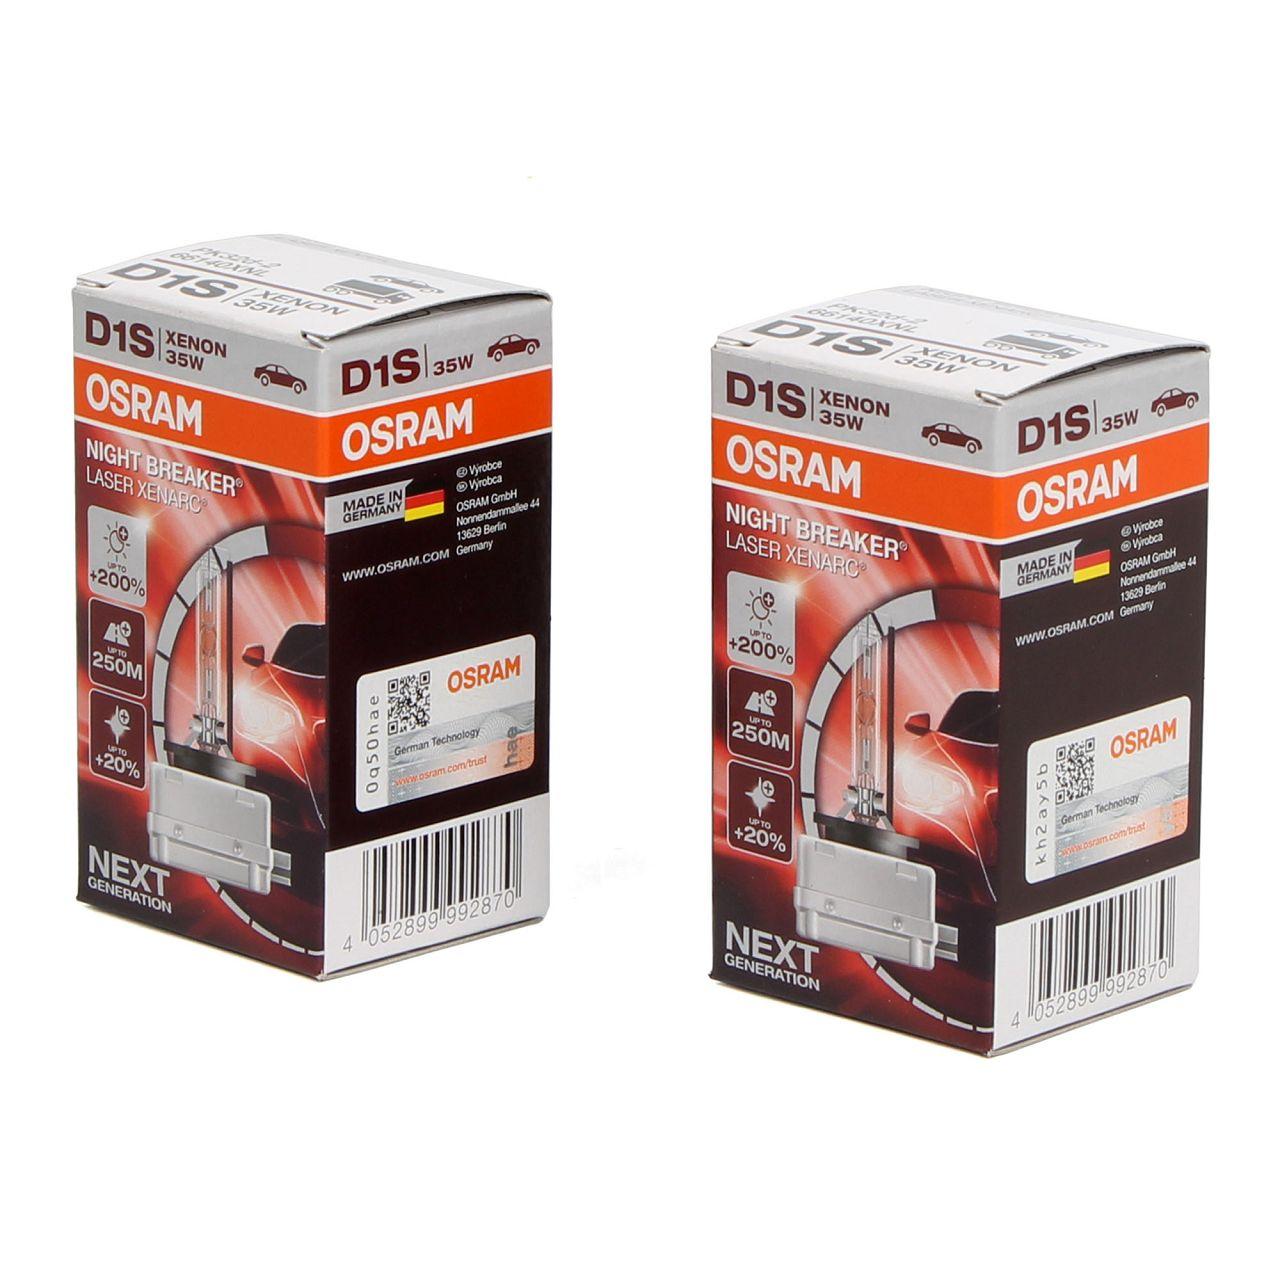 2x OSRAM Glühlampe D1S NIGHT BREAKER LASER 85V 35W PK32d-2 next Generation +200%